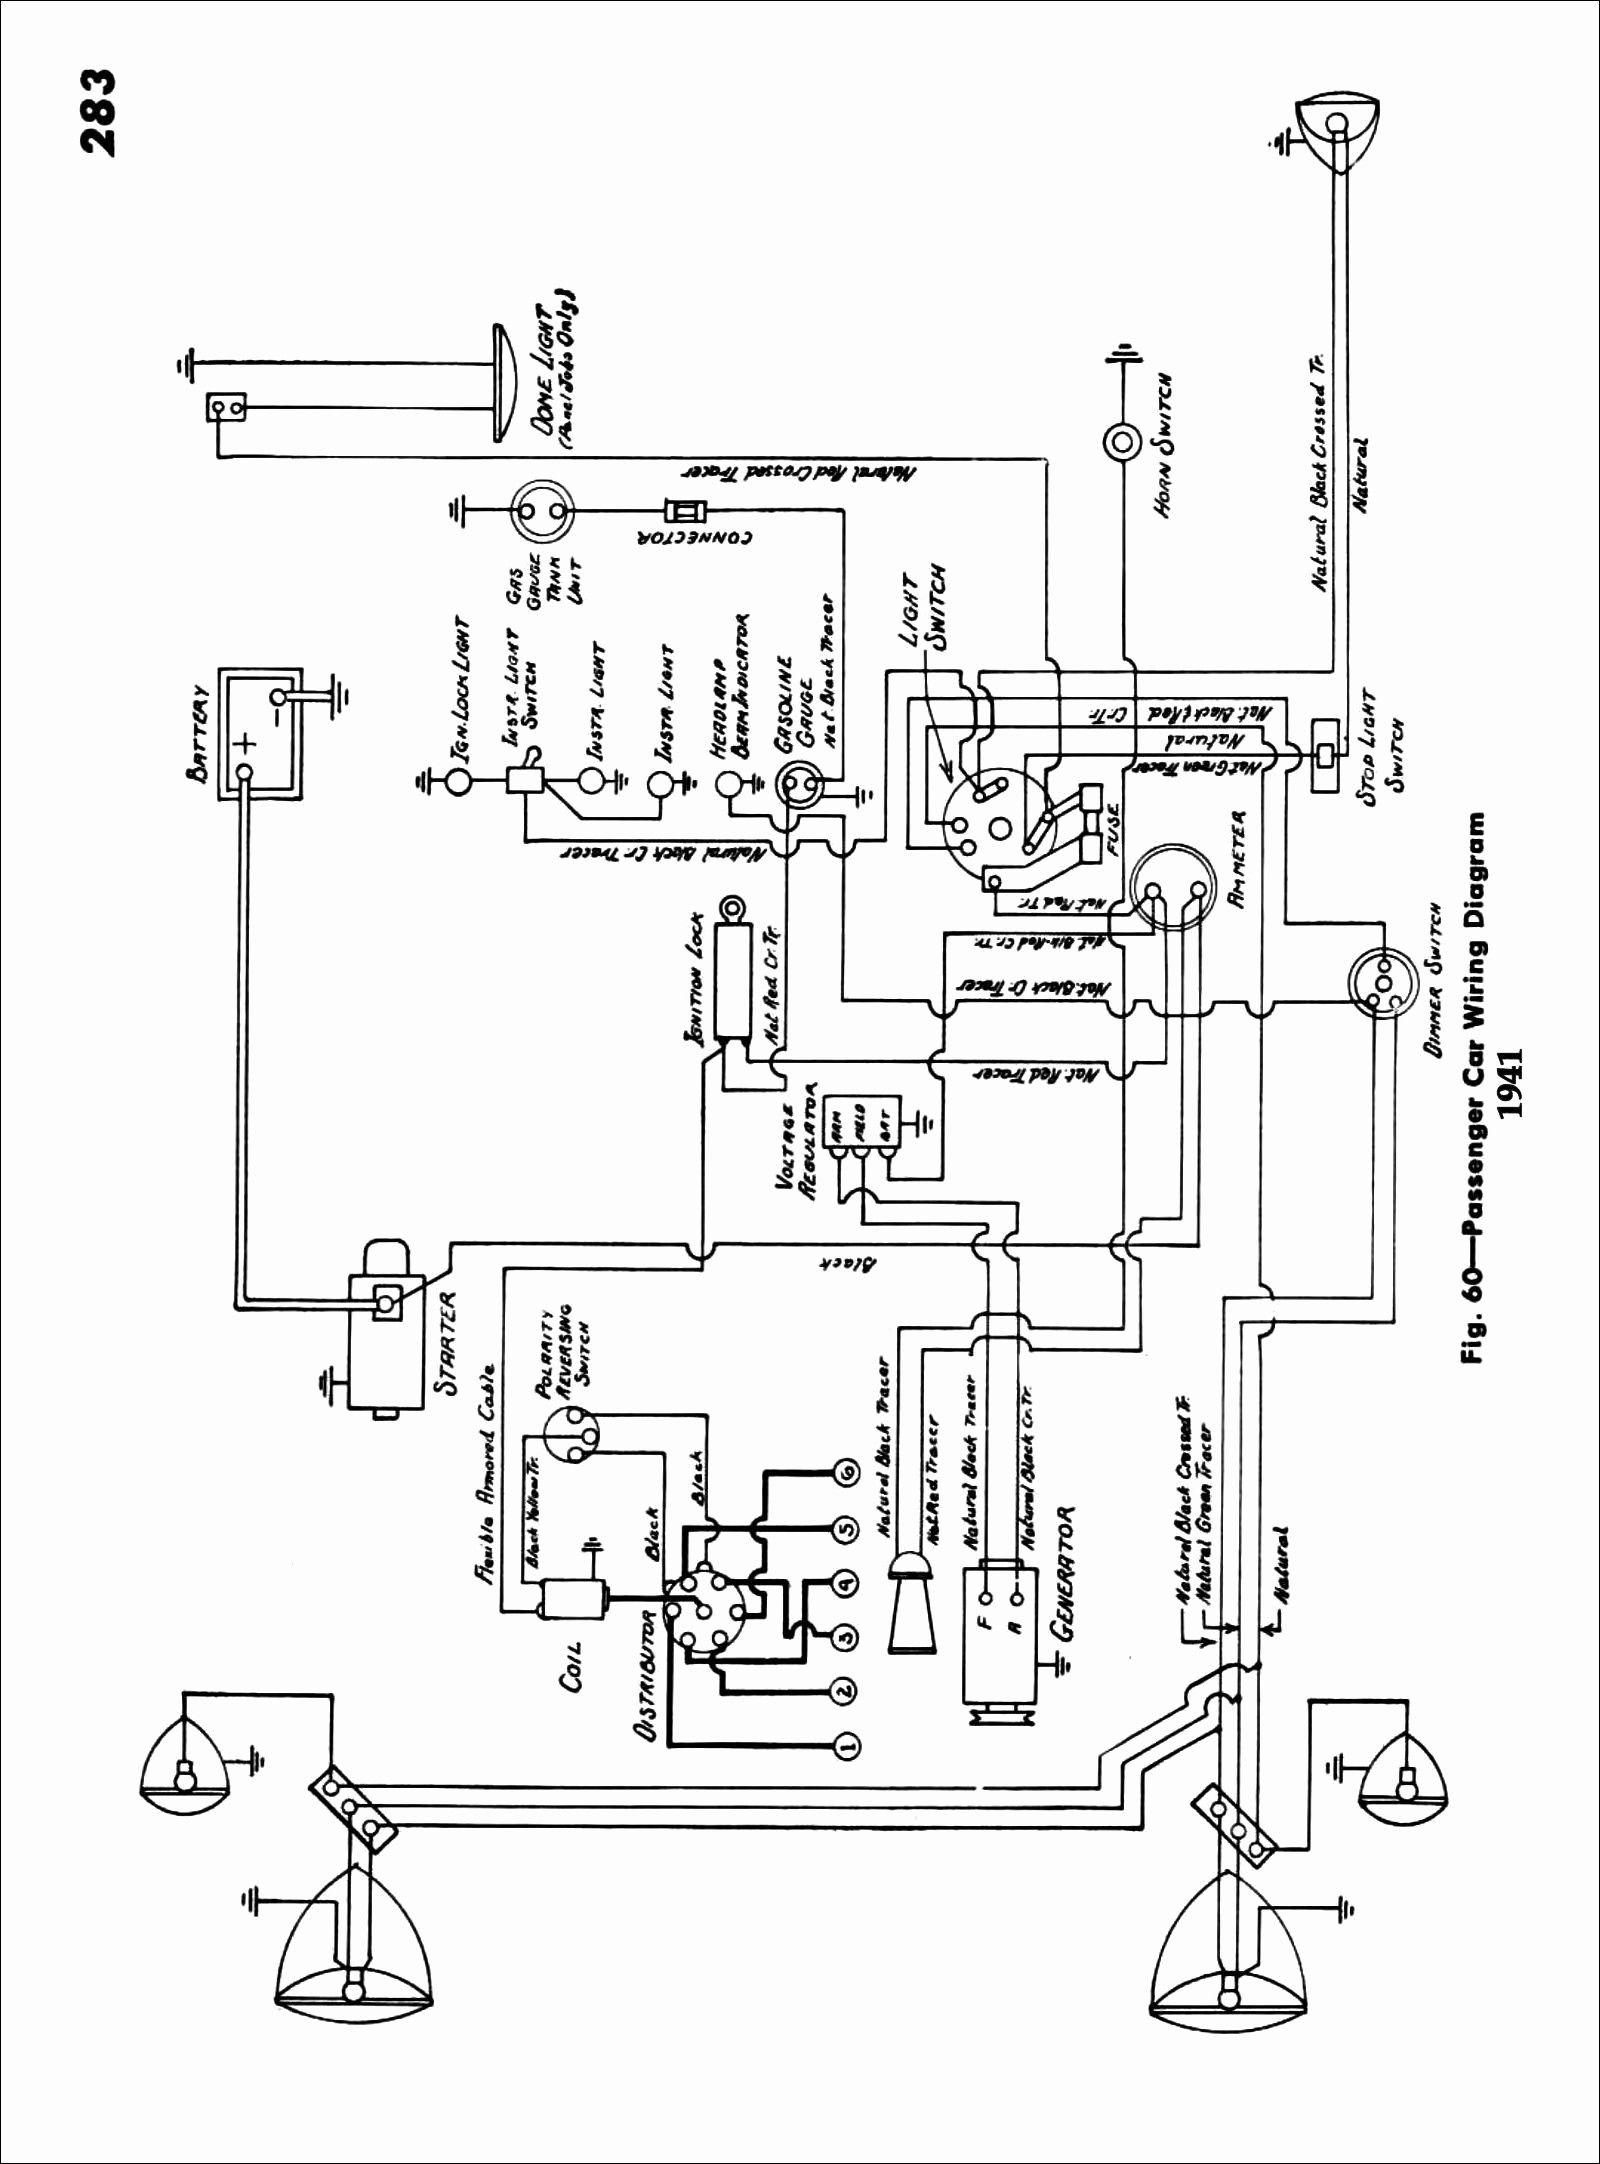 Elegant Honda Gx620 Wiring Diagram In 2020 1946 Chevy Truck 57 Chevy Trucks Chevy Trucks